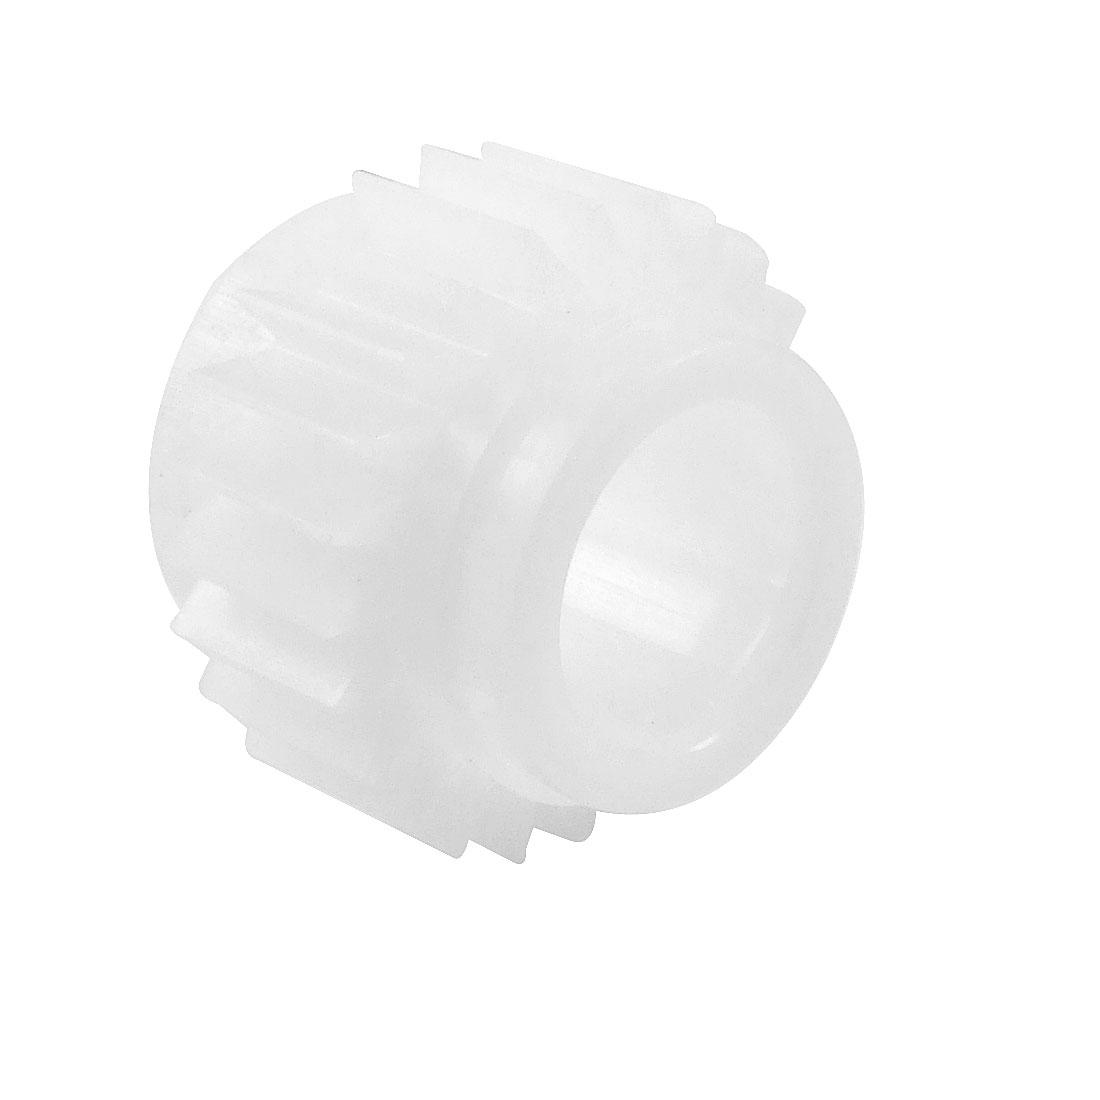 Plastic White 24 Teeth Clutch Ratchet Wheel for Washing Machine